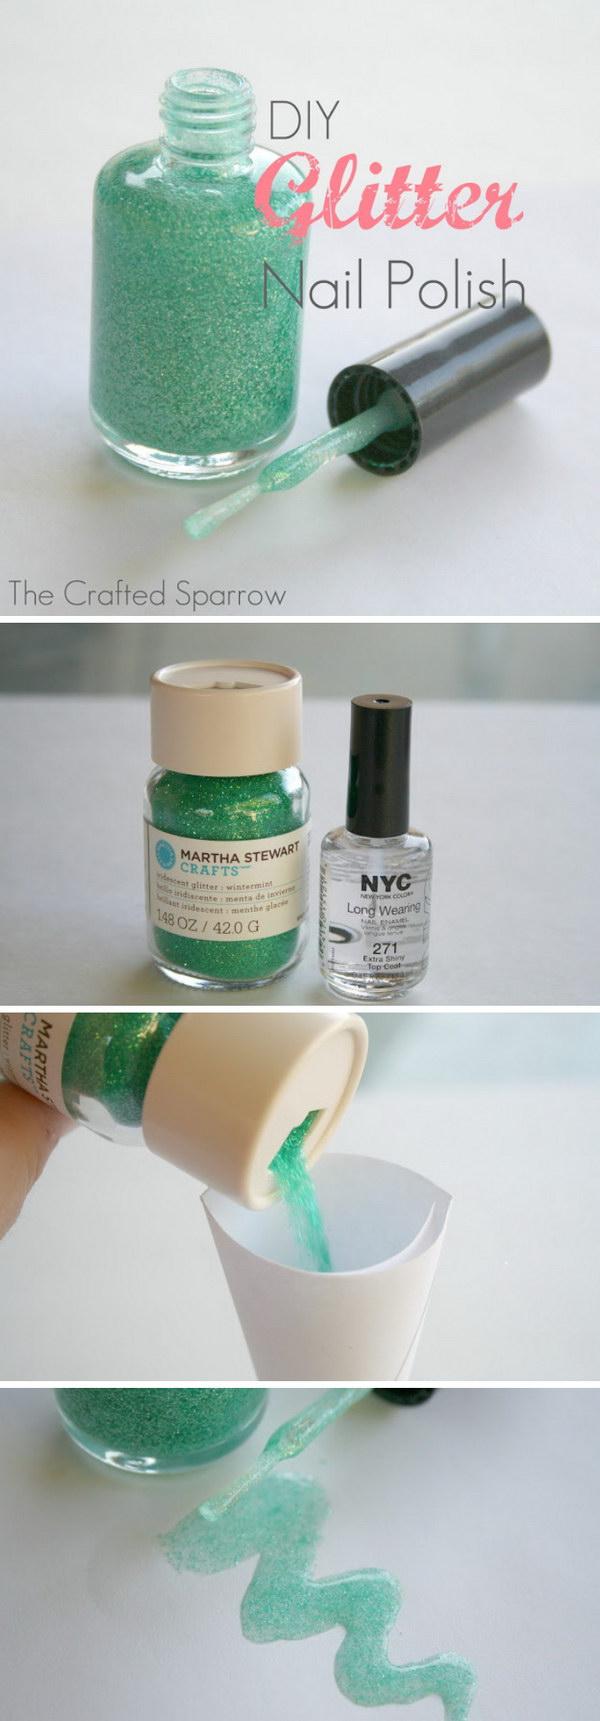 6 DIY Glitter Nail Polish